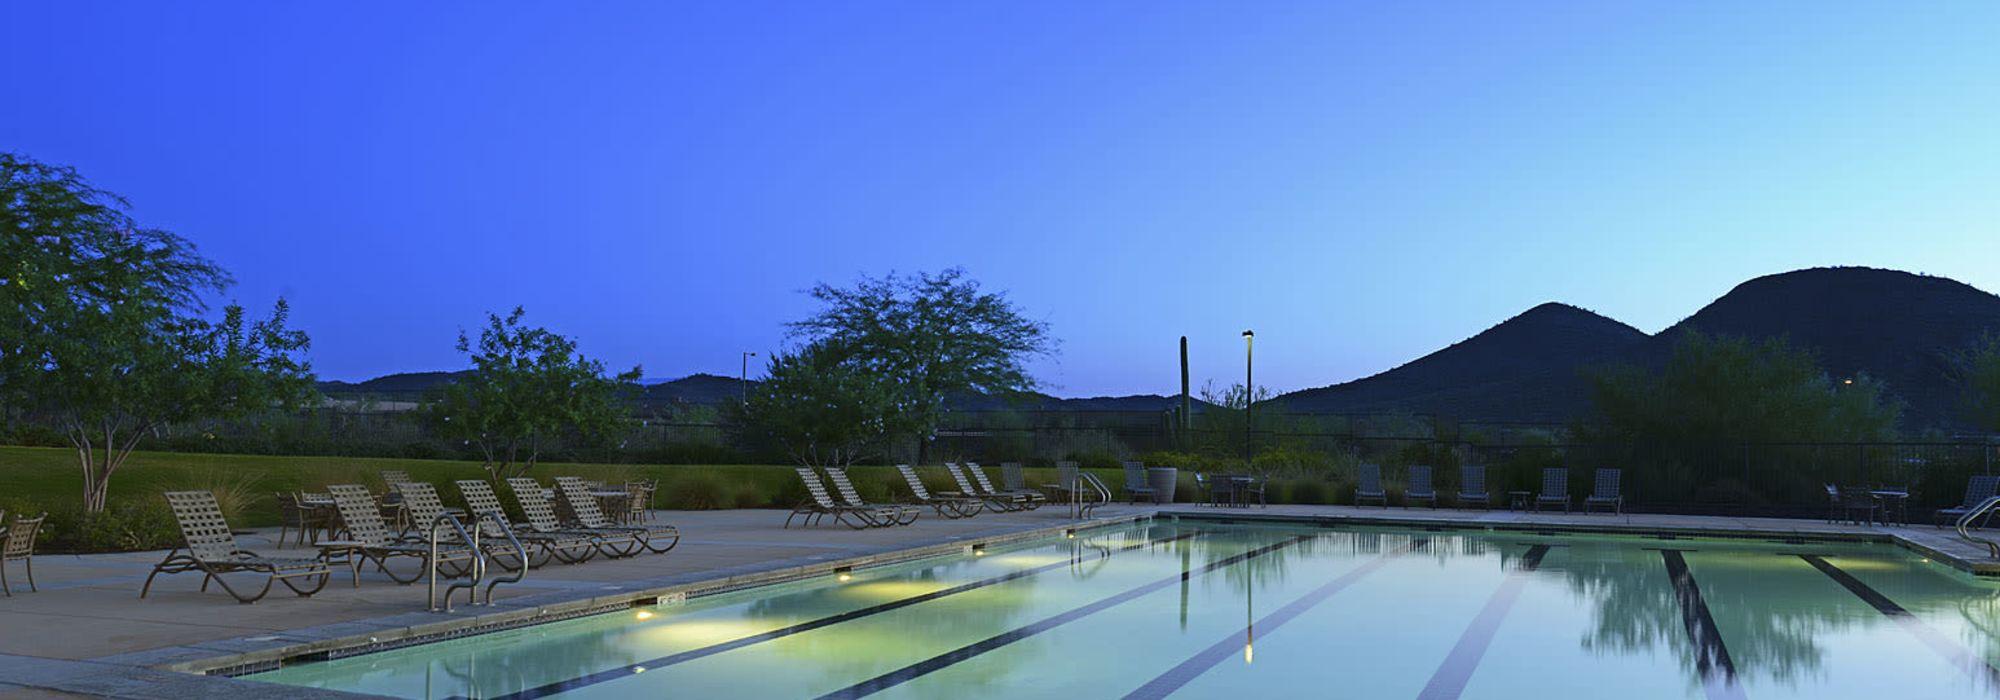 Lap swimming pool at BB Living at Vistancia in Peoria, Arizona